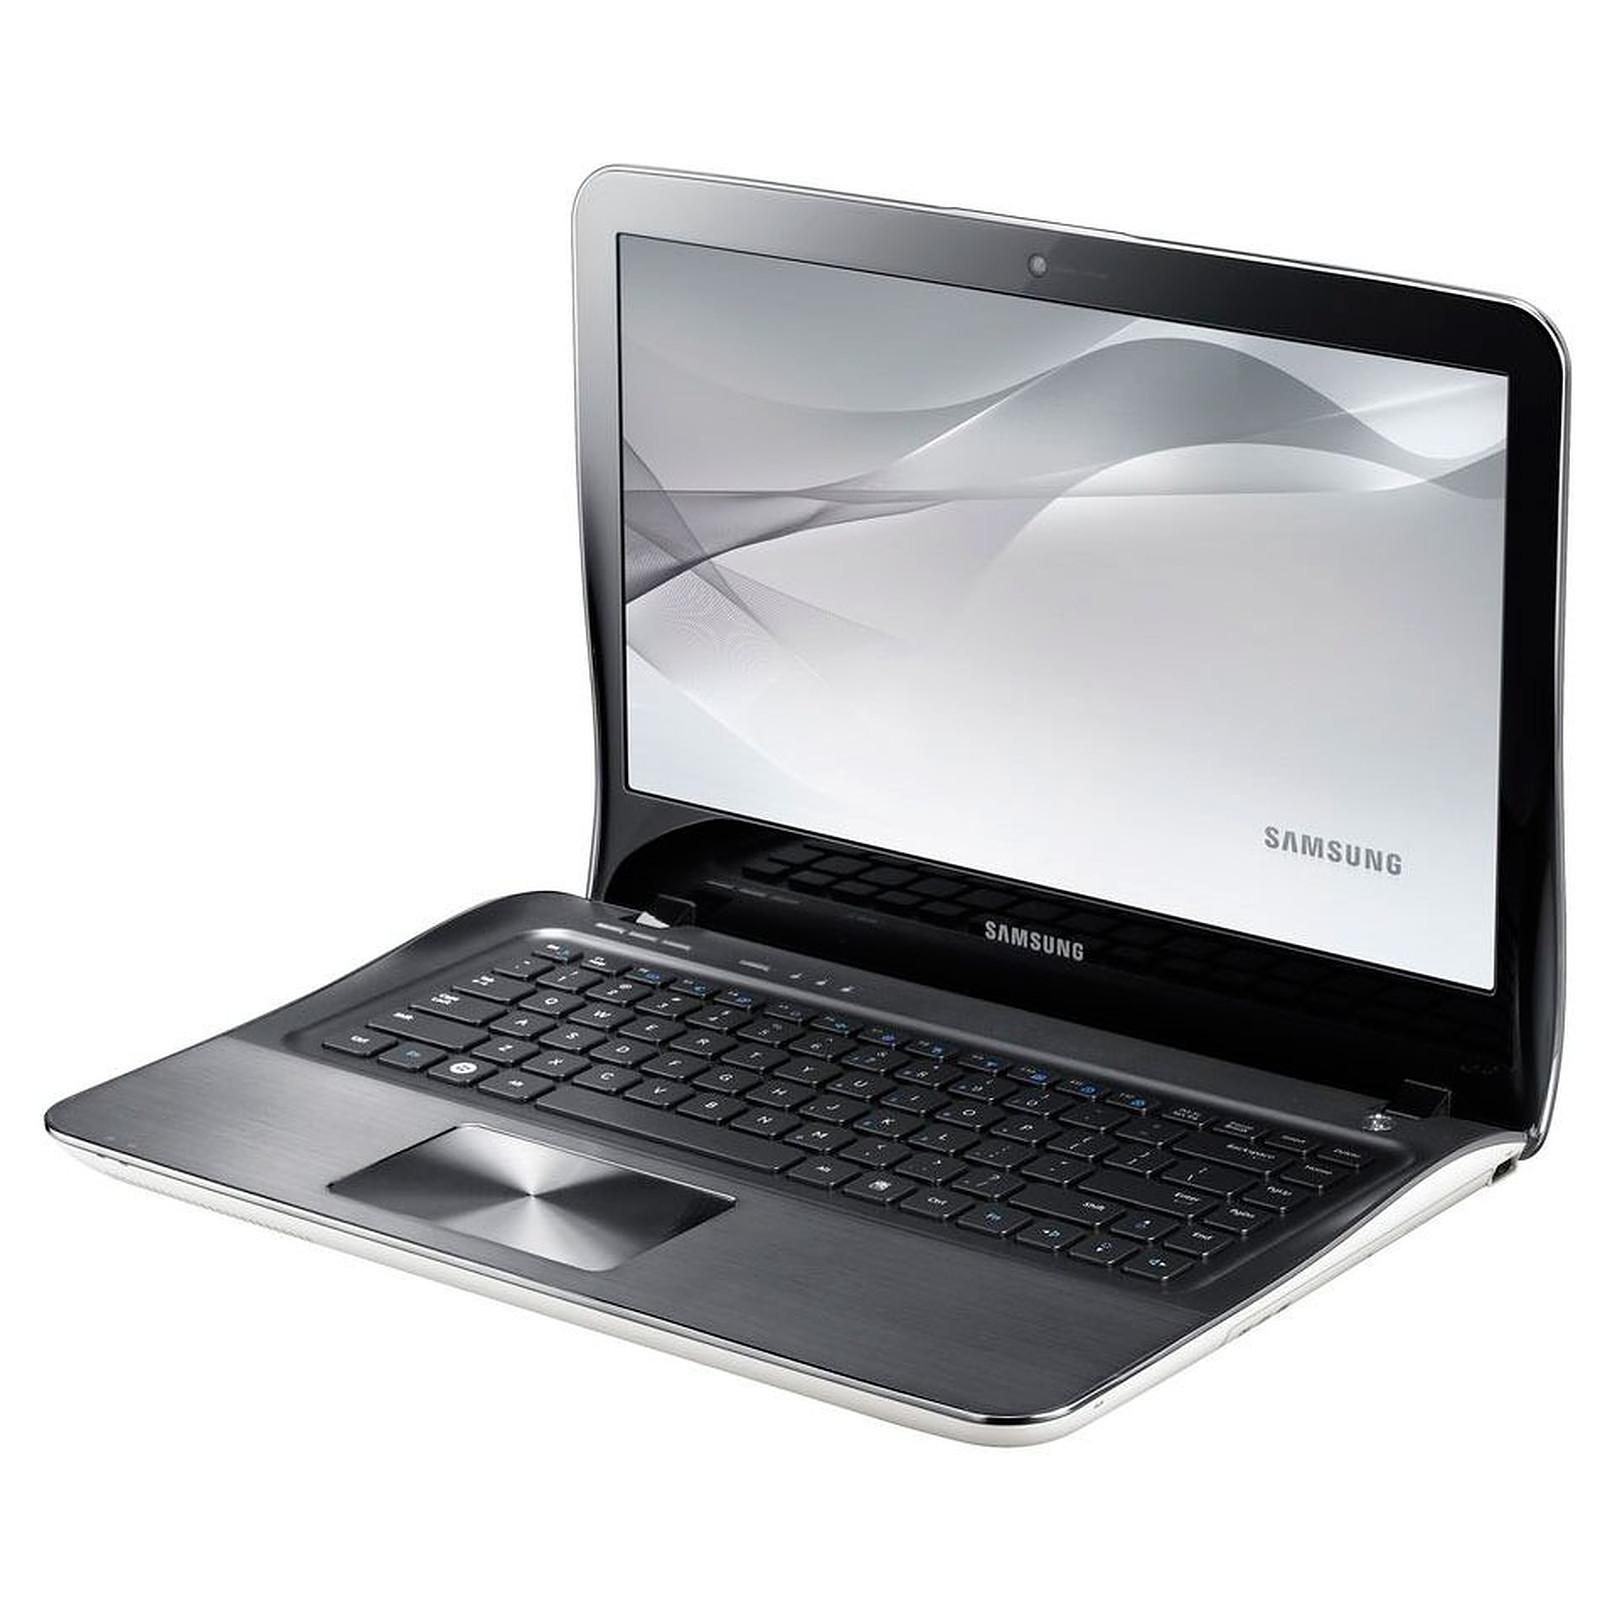 Samsung SF310 E7P-C5480